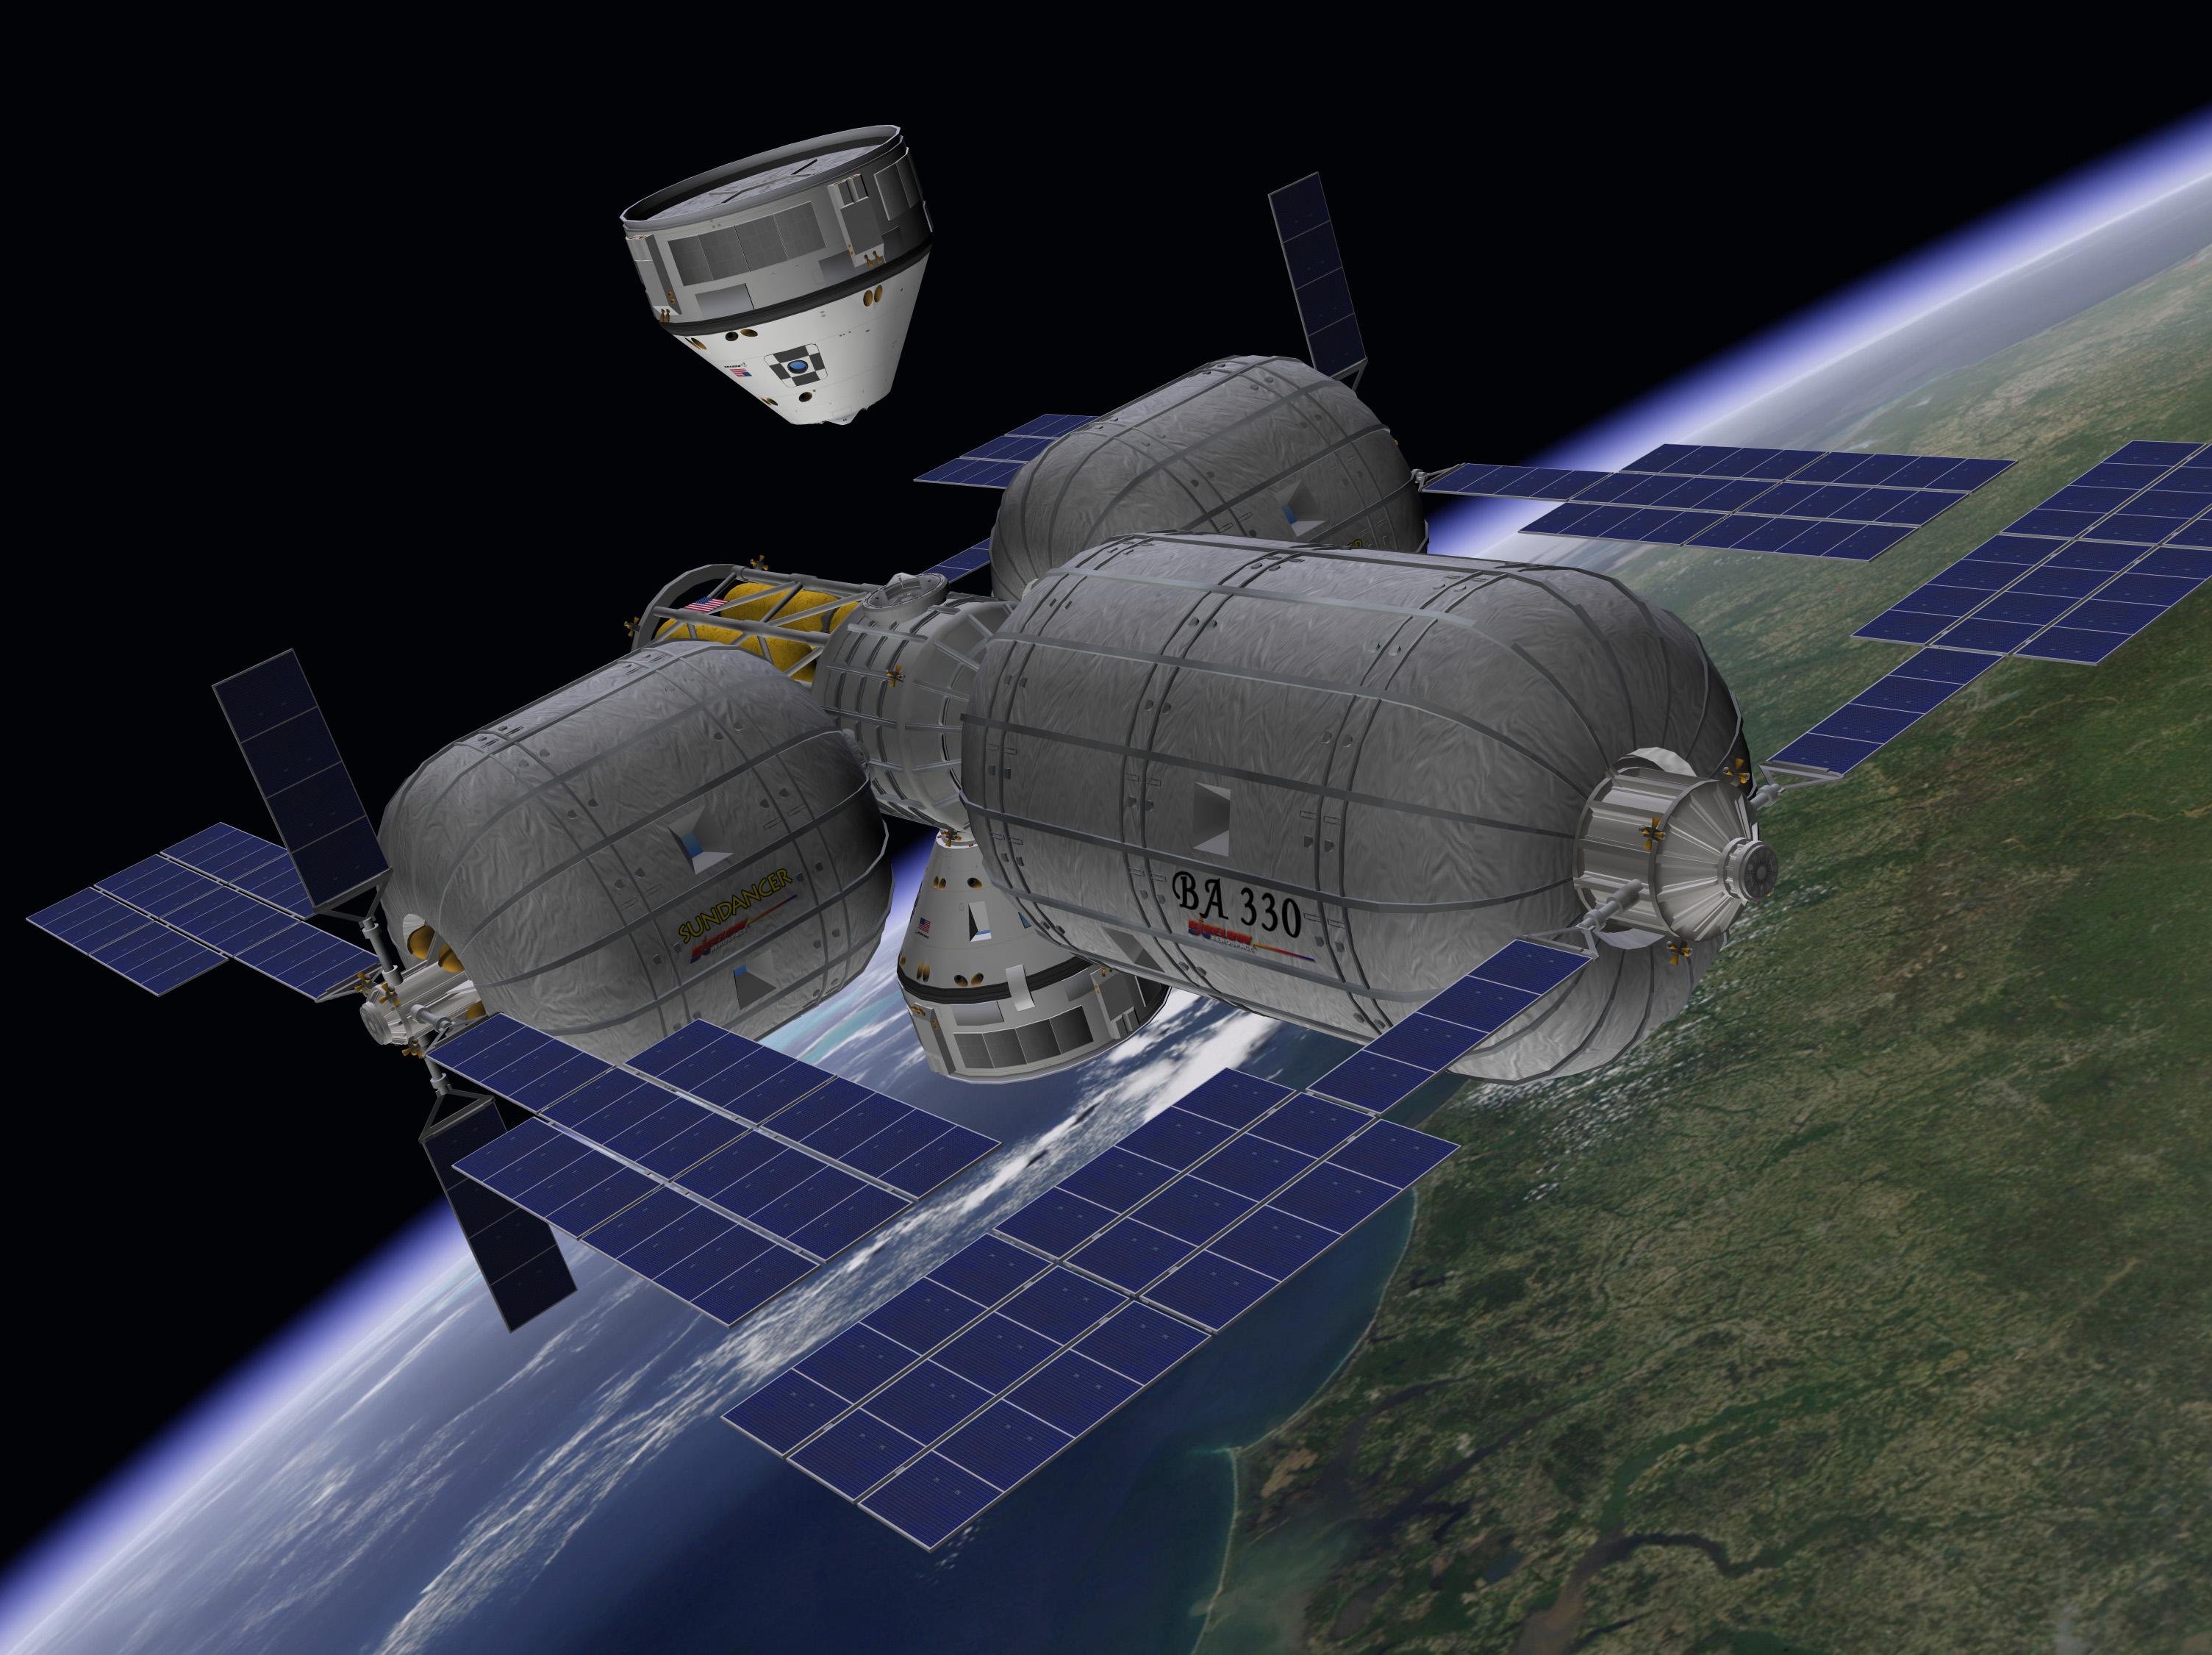 astronaut on spaceship - photo #37